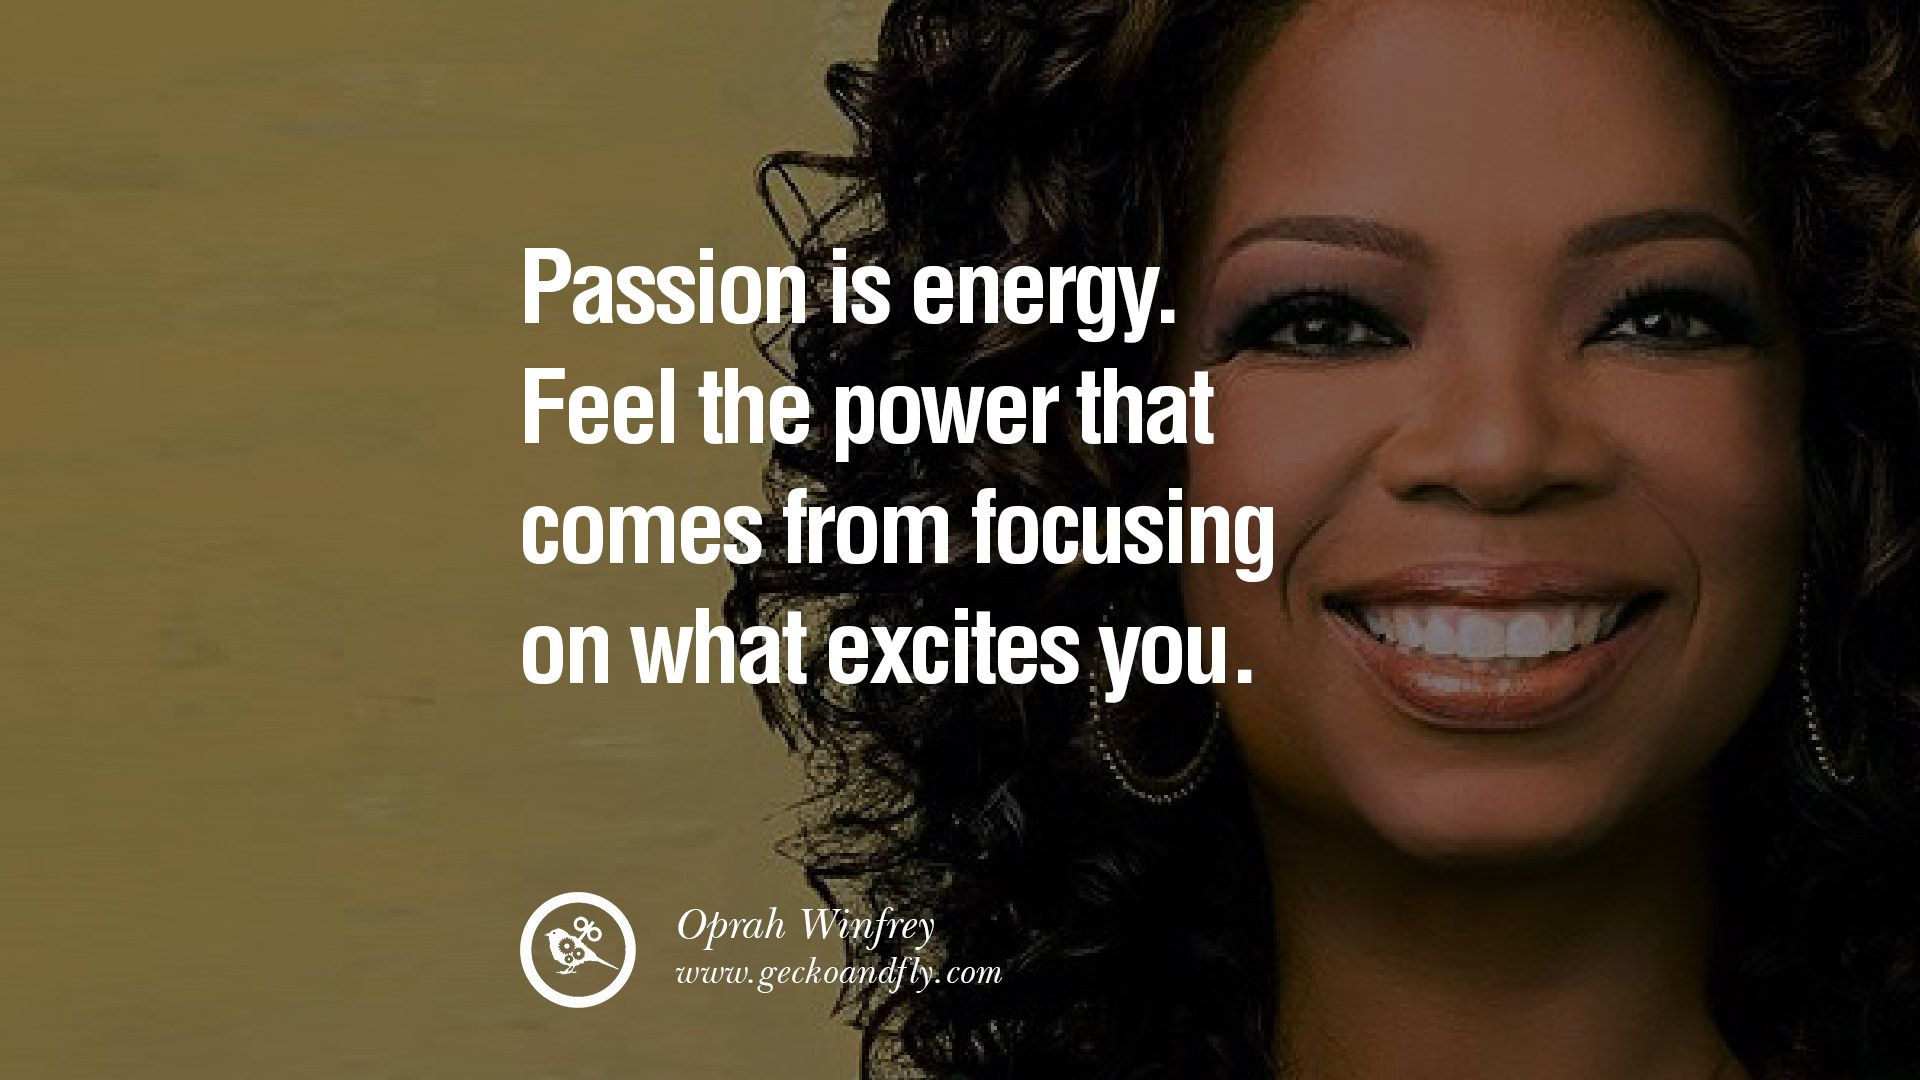 Quotes By Famous Women Famous Quotes About Successwomen Picture